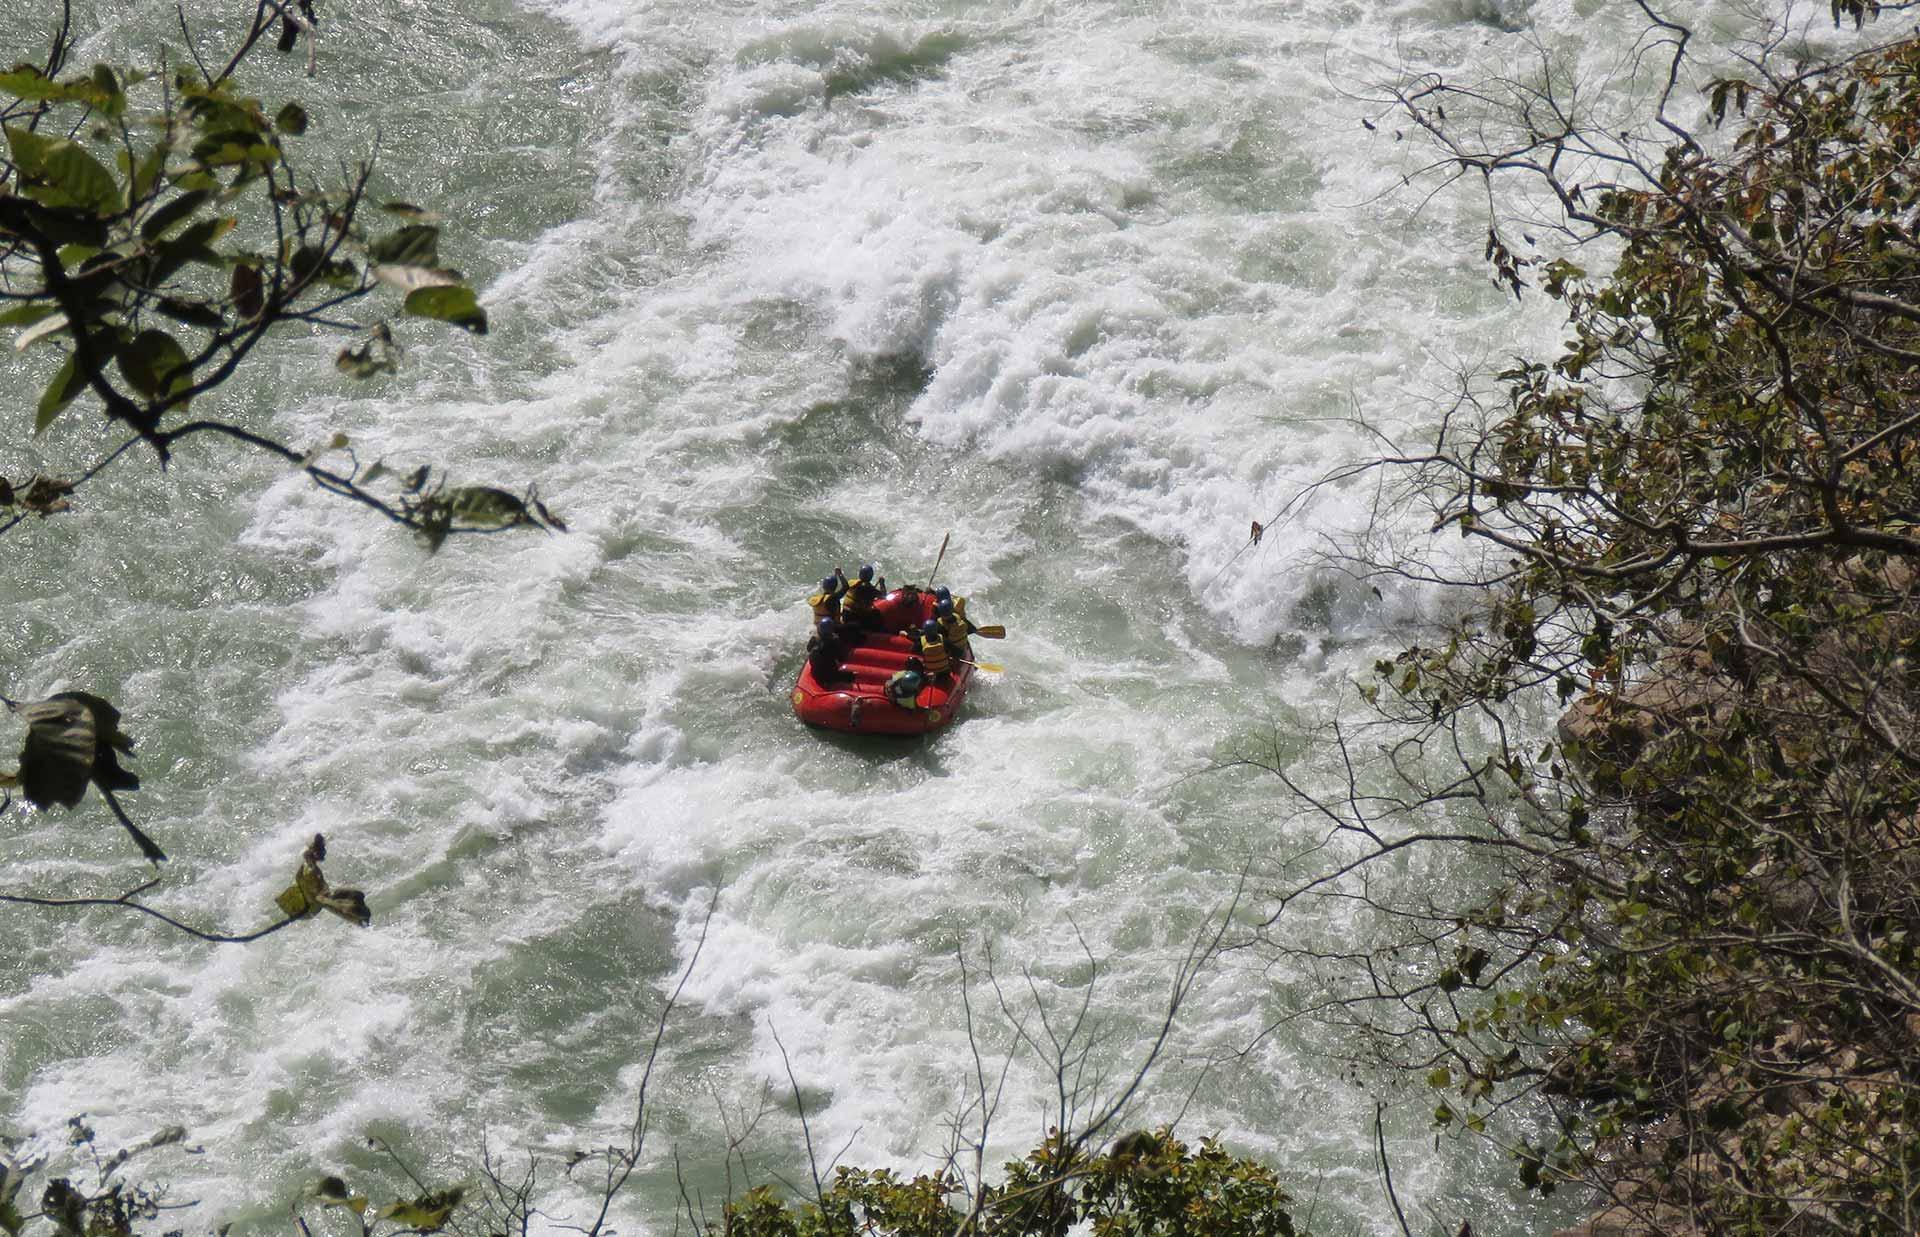 http://m.thegreatnext.com/Wet N Wild Rafting Ganga Brahmapuri Laxmanjhula Rishikesh